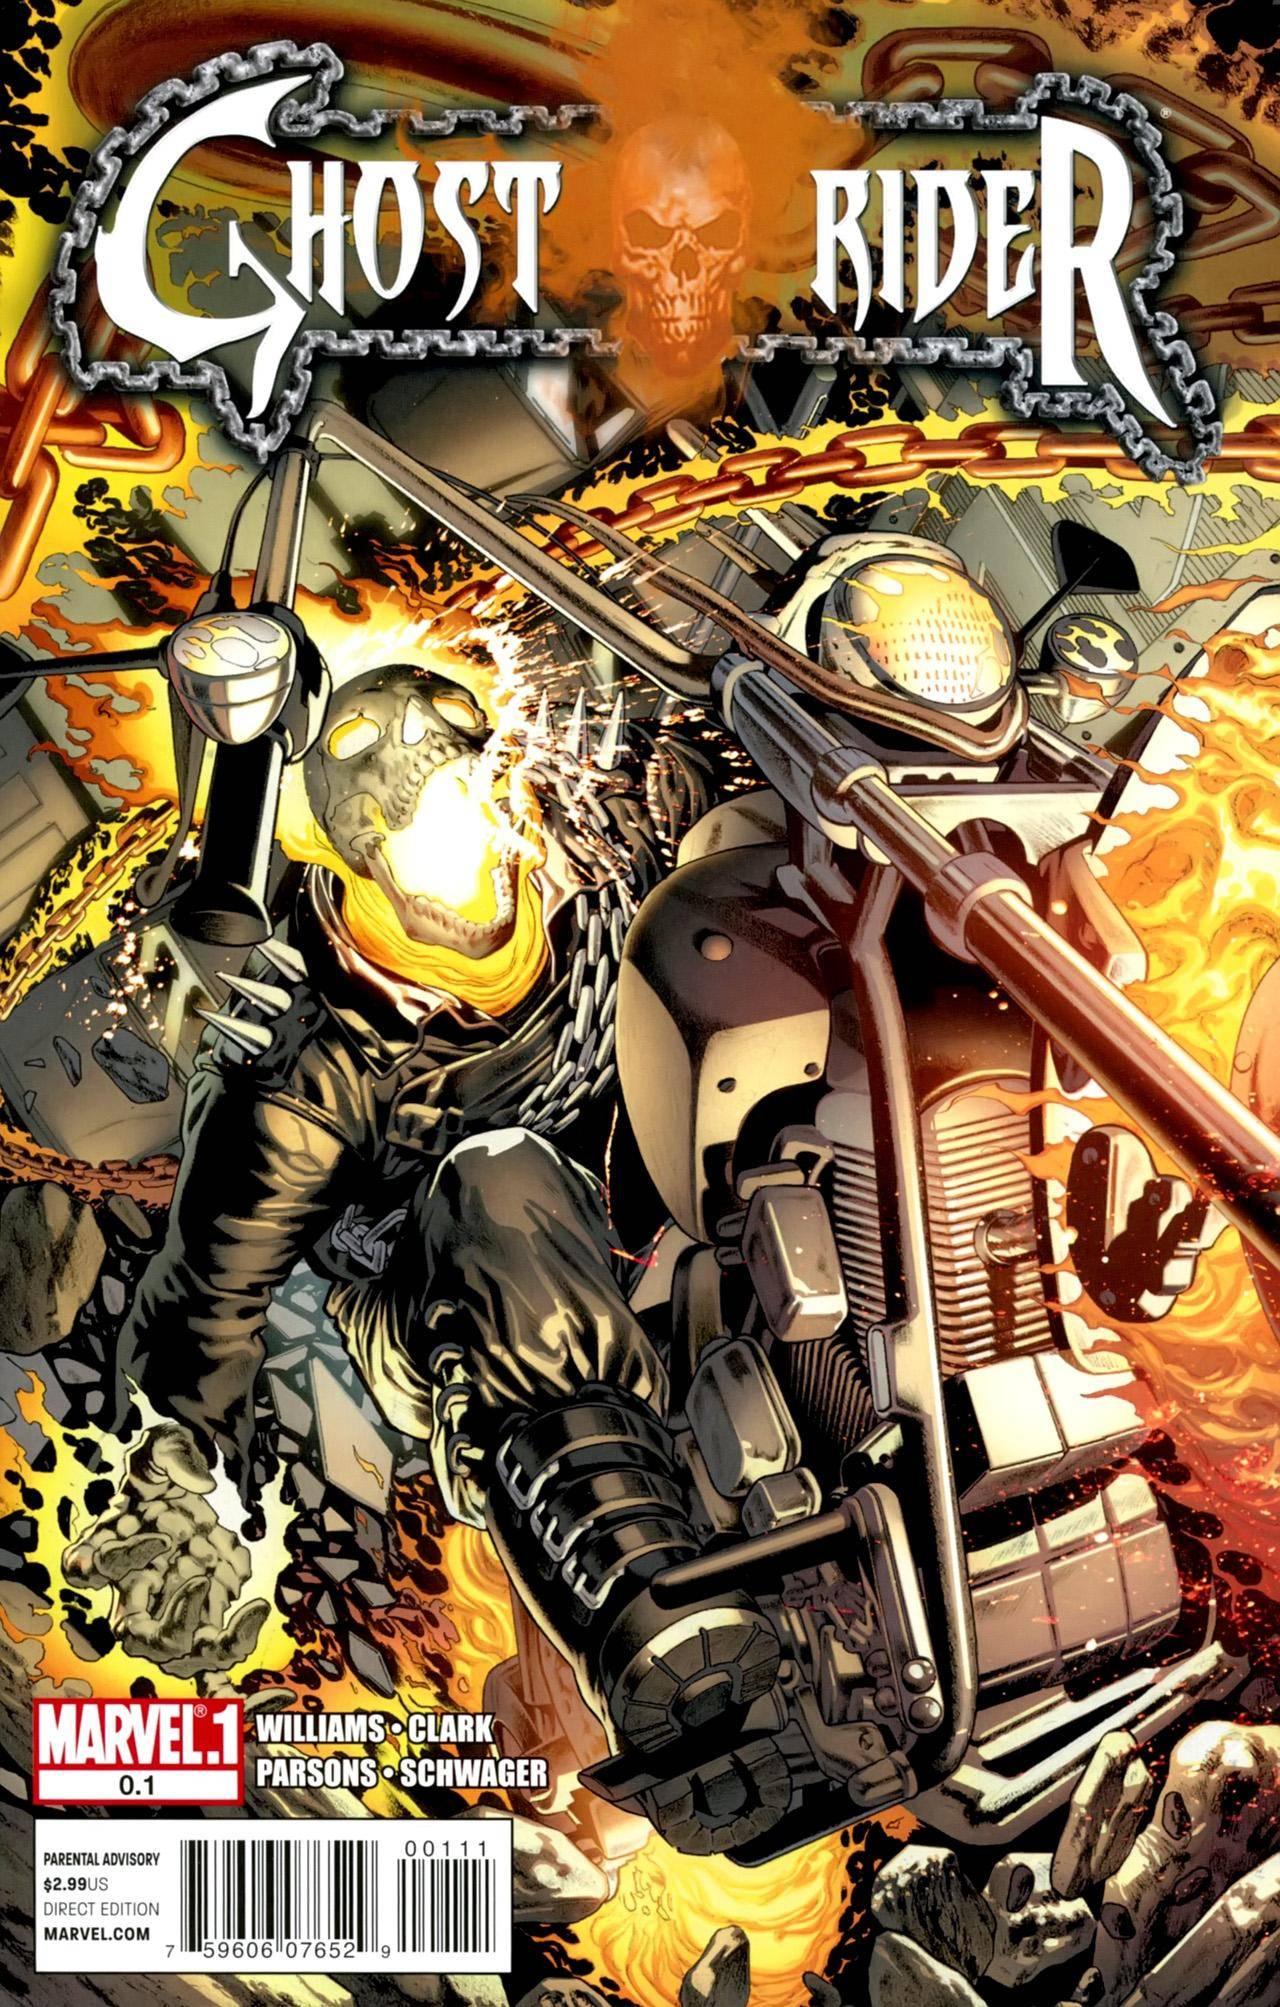 Ghost Rider 000 1 2011 noads Archoboros-CPS